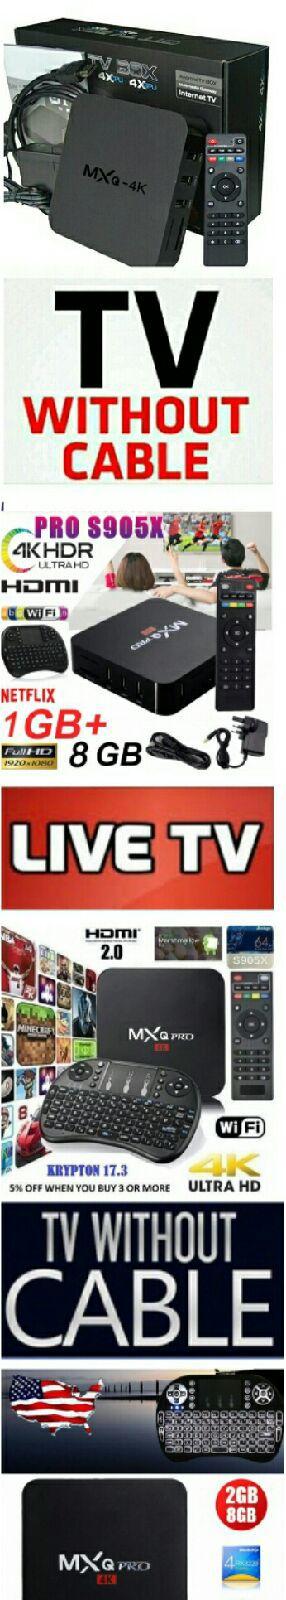 Android TV Box Fully Loaded w Kodi 17.6 Live TV PPVs better than fire tv sticks firesticks! for Sale in Las Vegas, NV